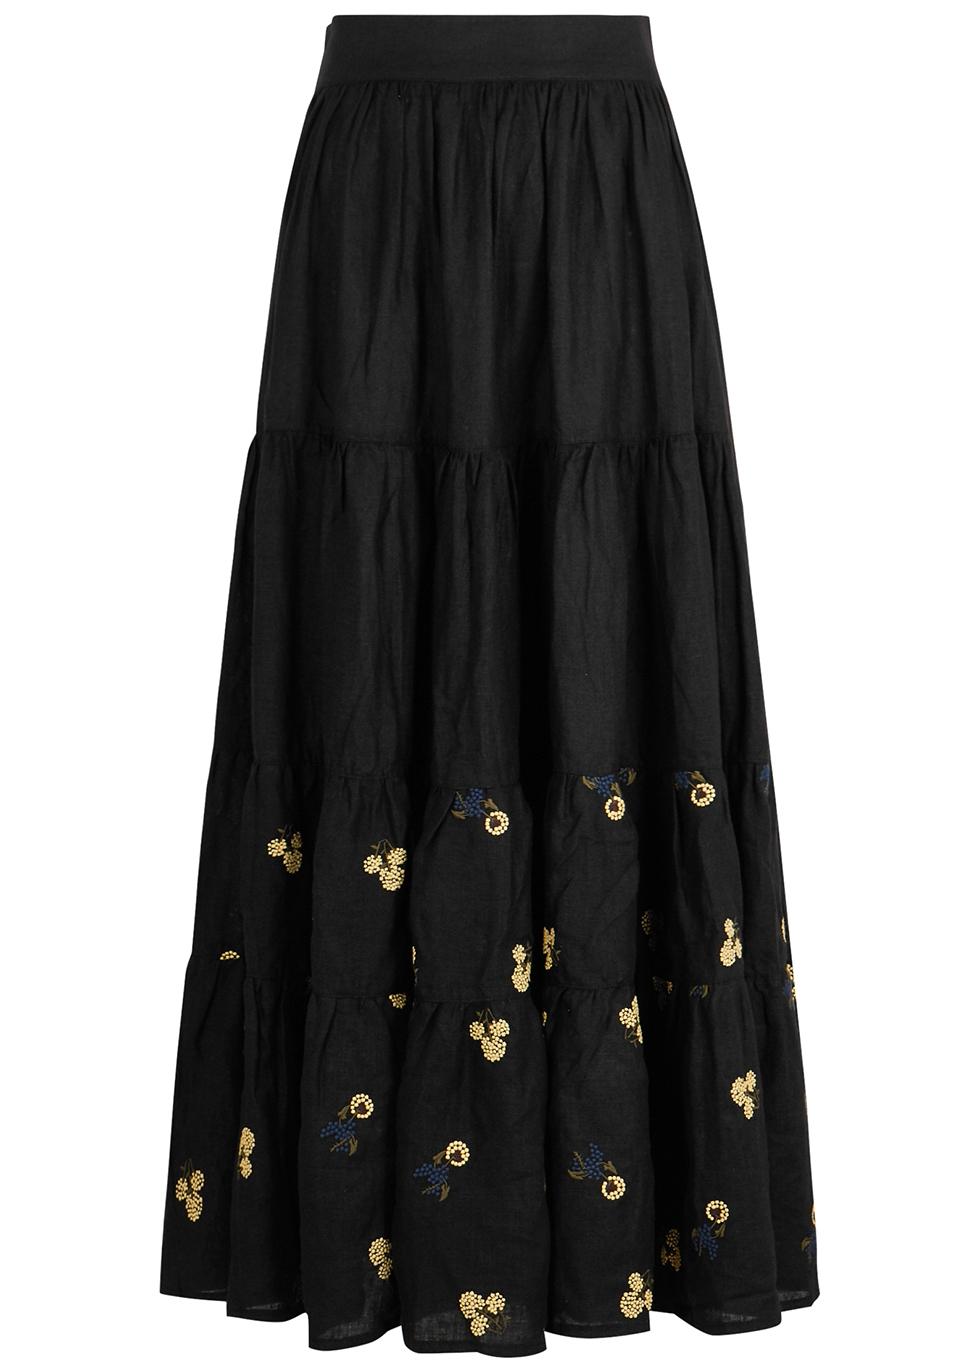 Daphne black embroidered linen skirt